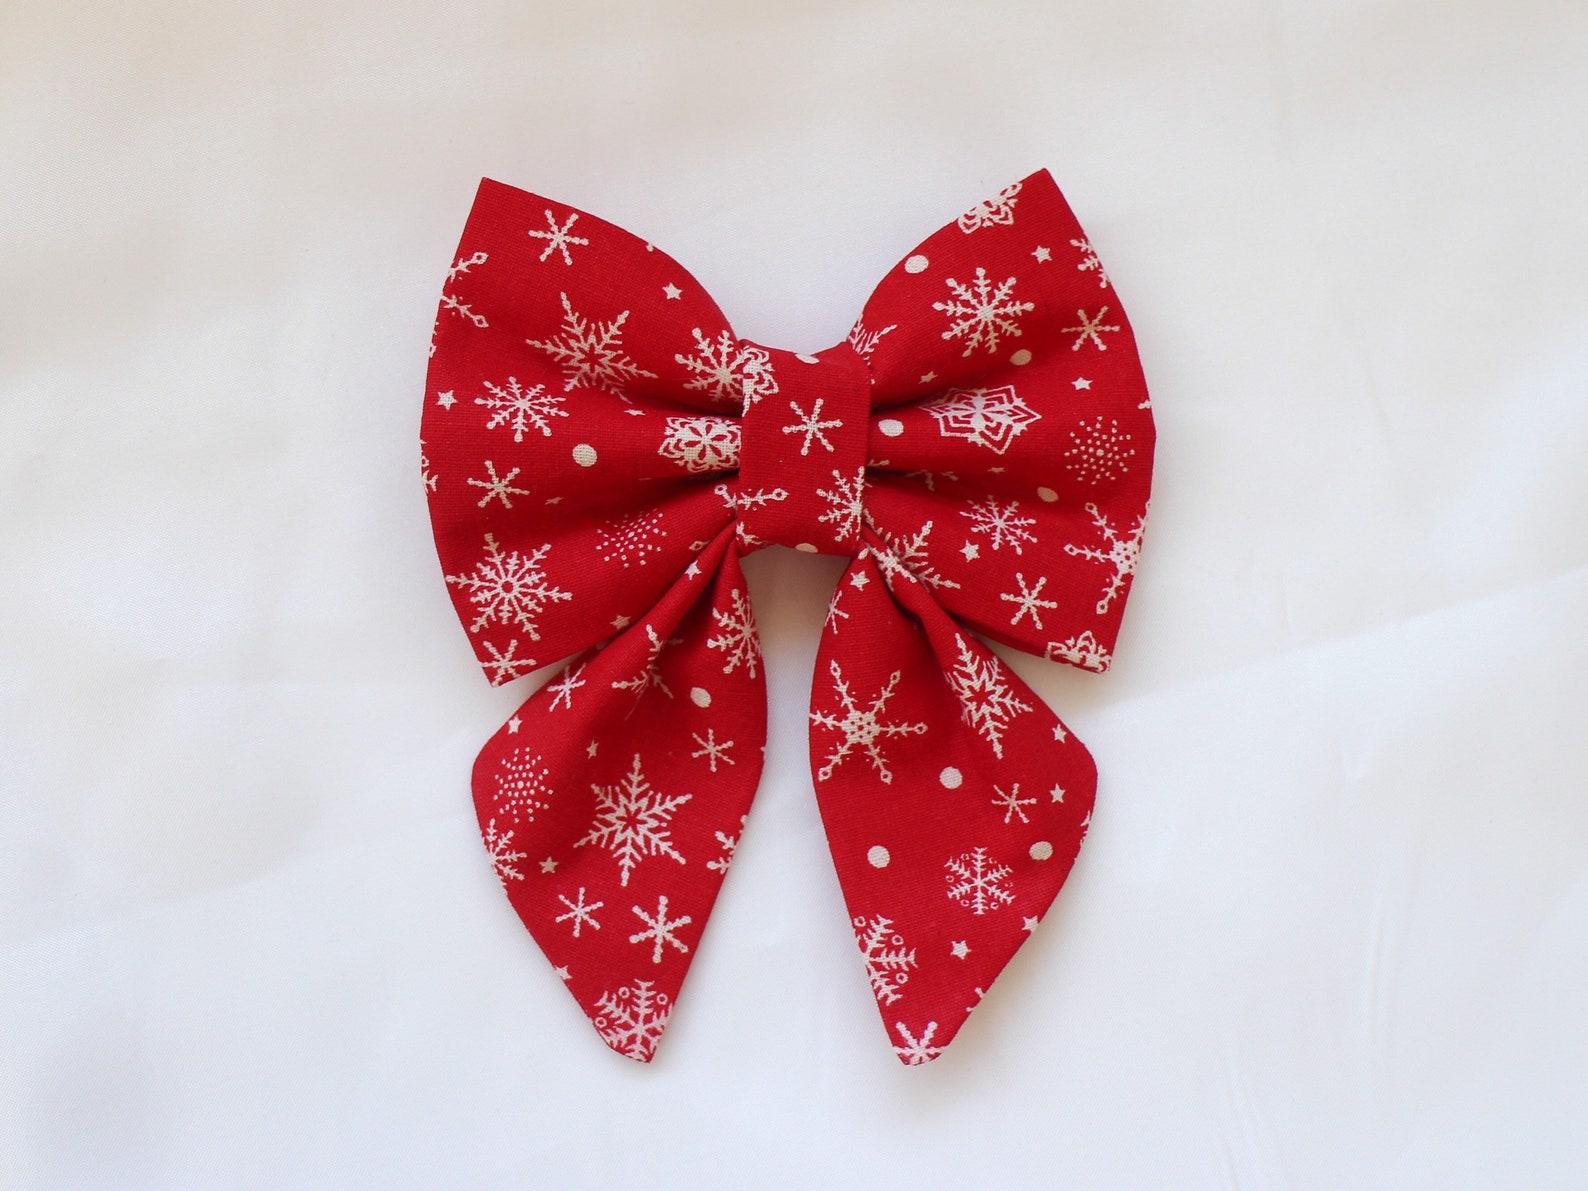 Dog bow tie with Christmas print